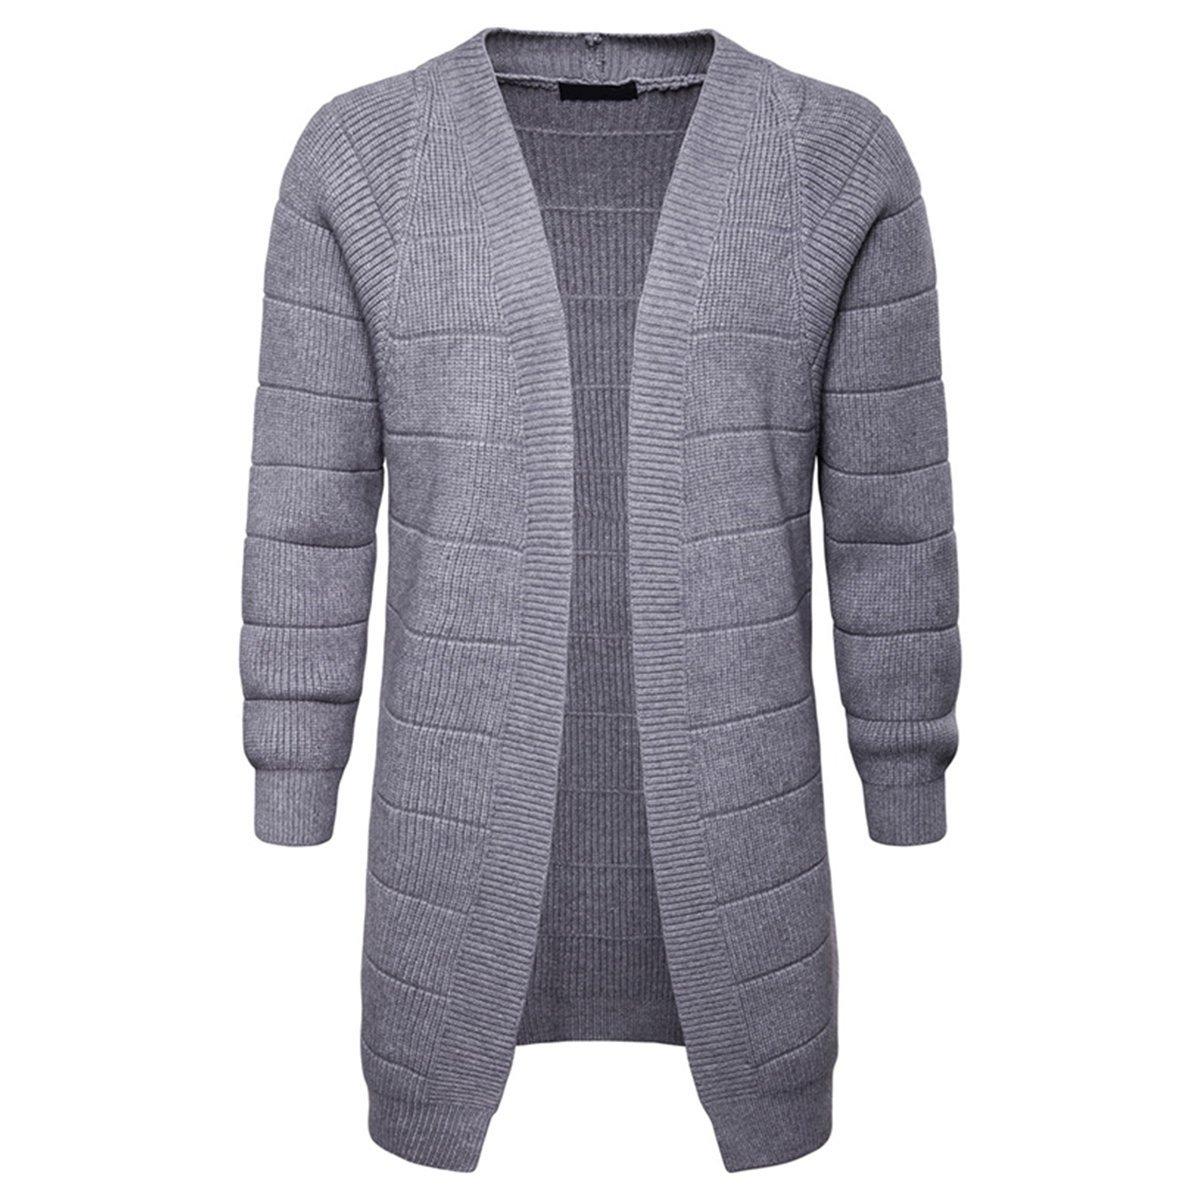 5517395ecb76b Grey Grey Grey AOWOFS Men's Cardigan Knit Stripe Long Sweater Solid color  Buckleless Casual Long Sleeve f56142